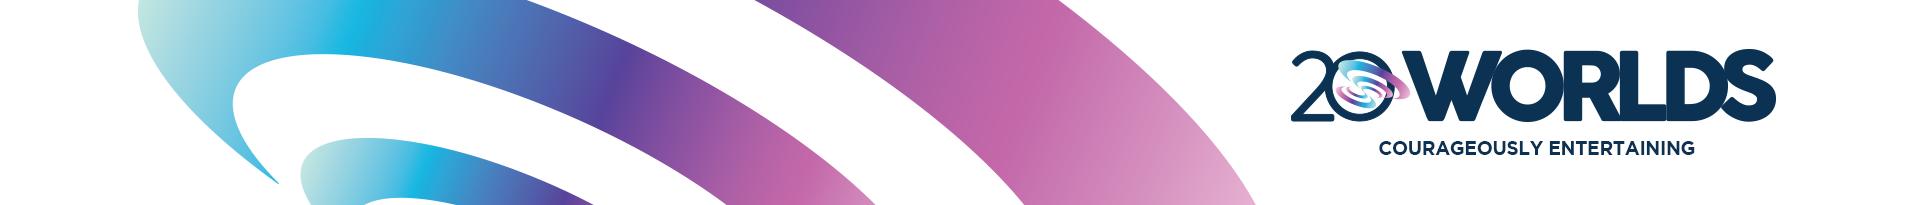 Image of 20 Worlds Dektop Header image